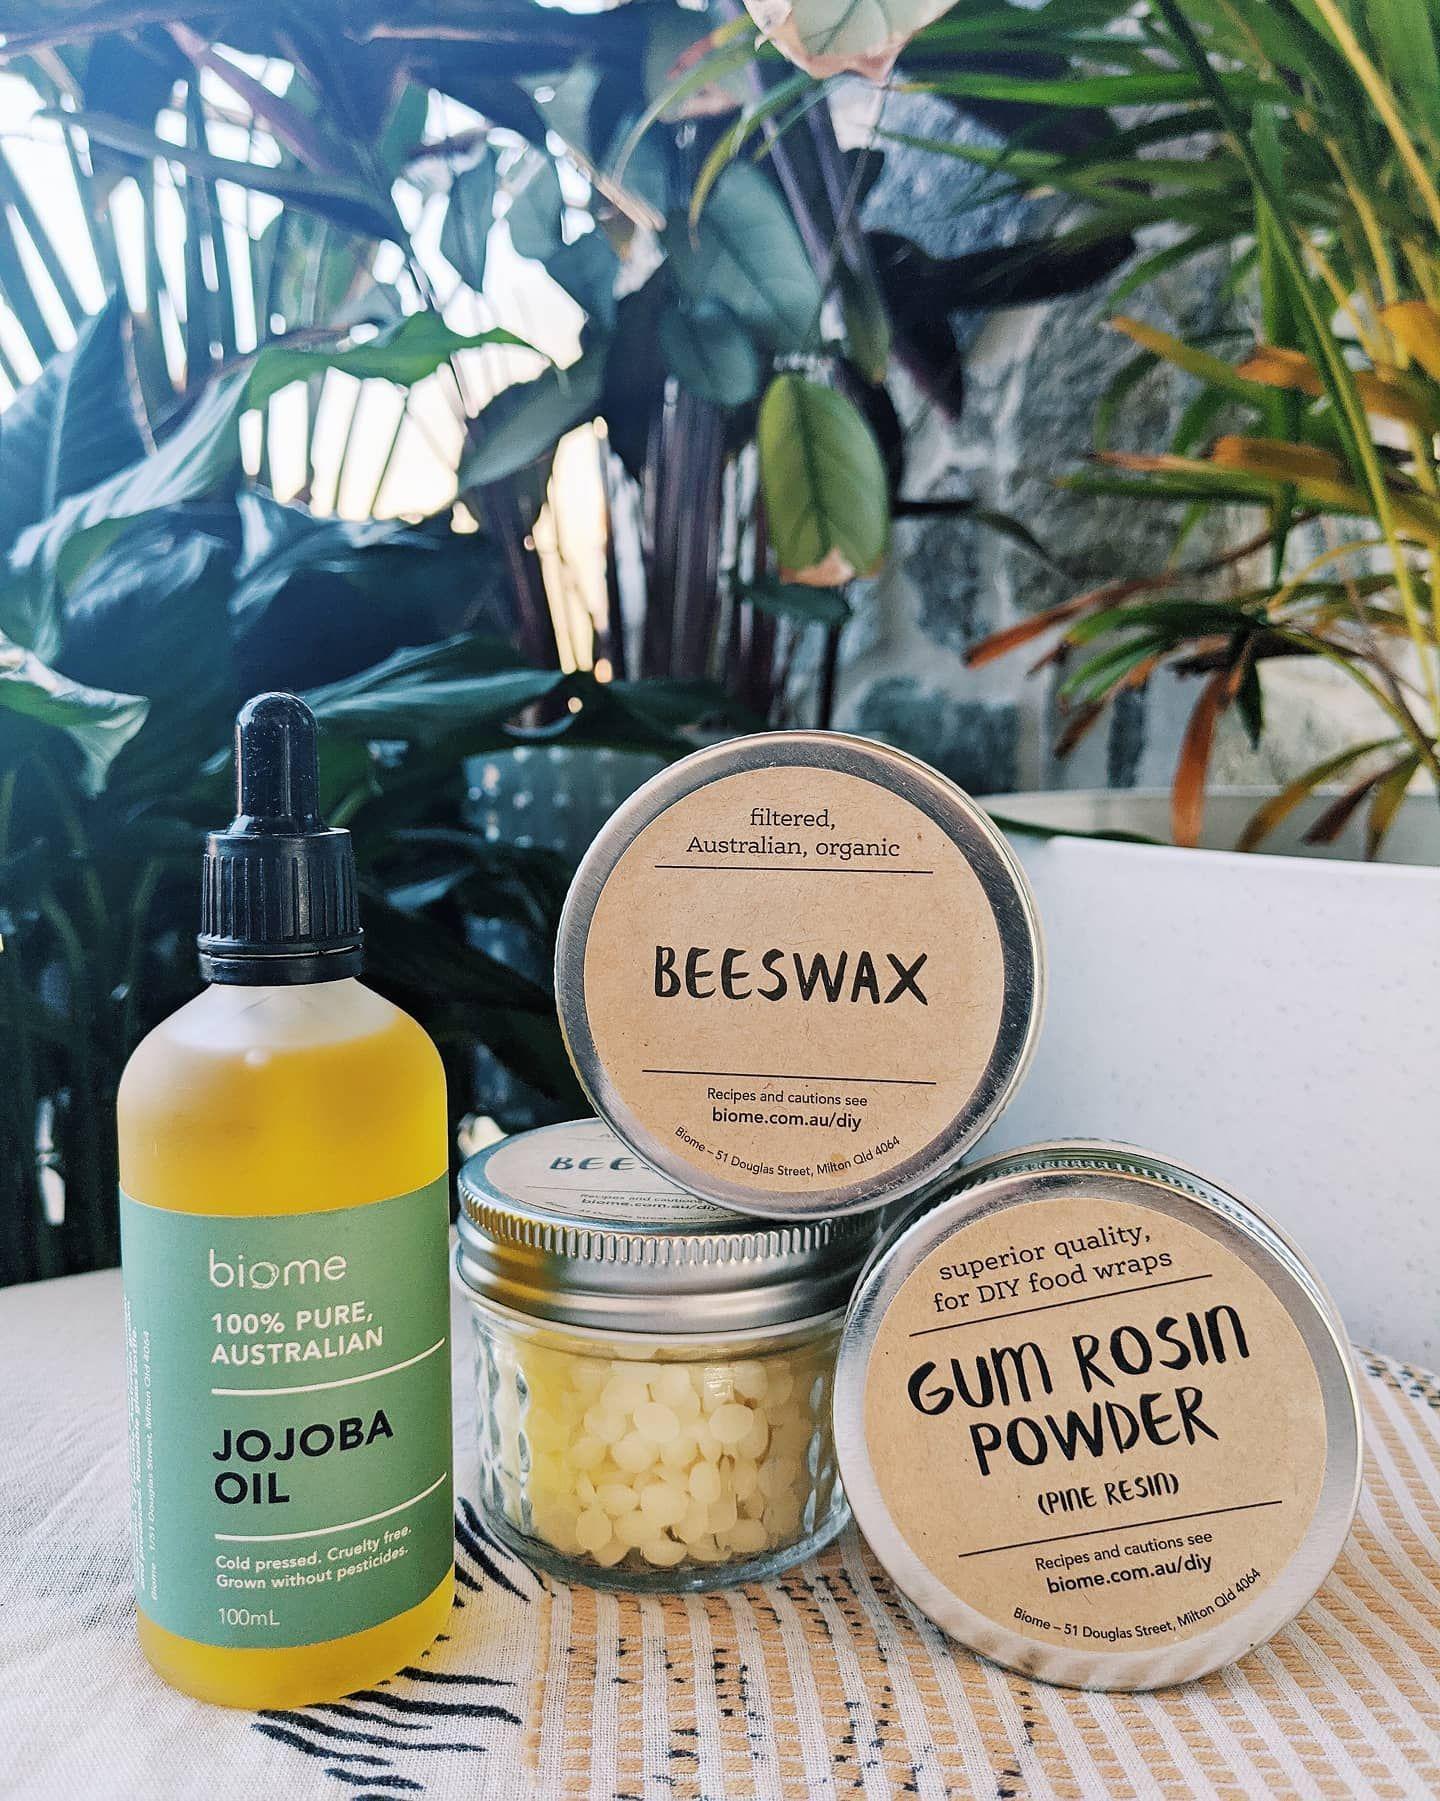 Biome eco stores diy skincare ingredients in 2020 diy